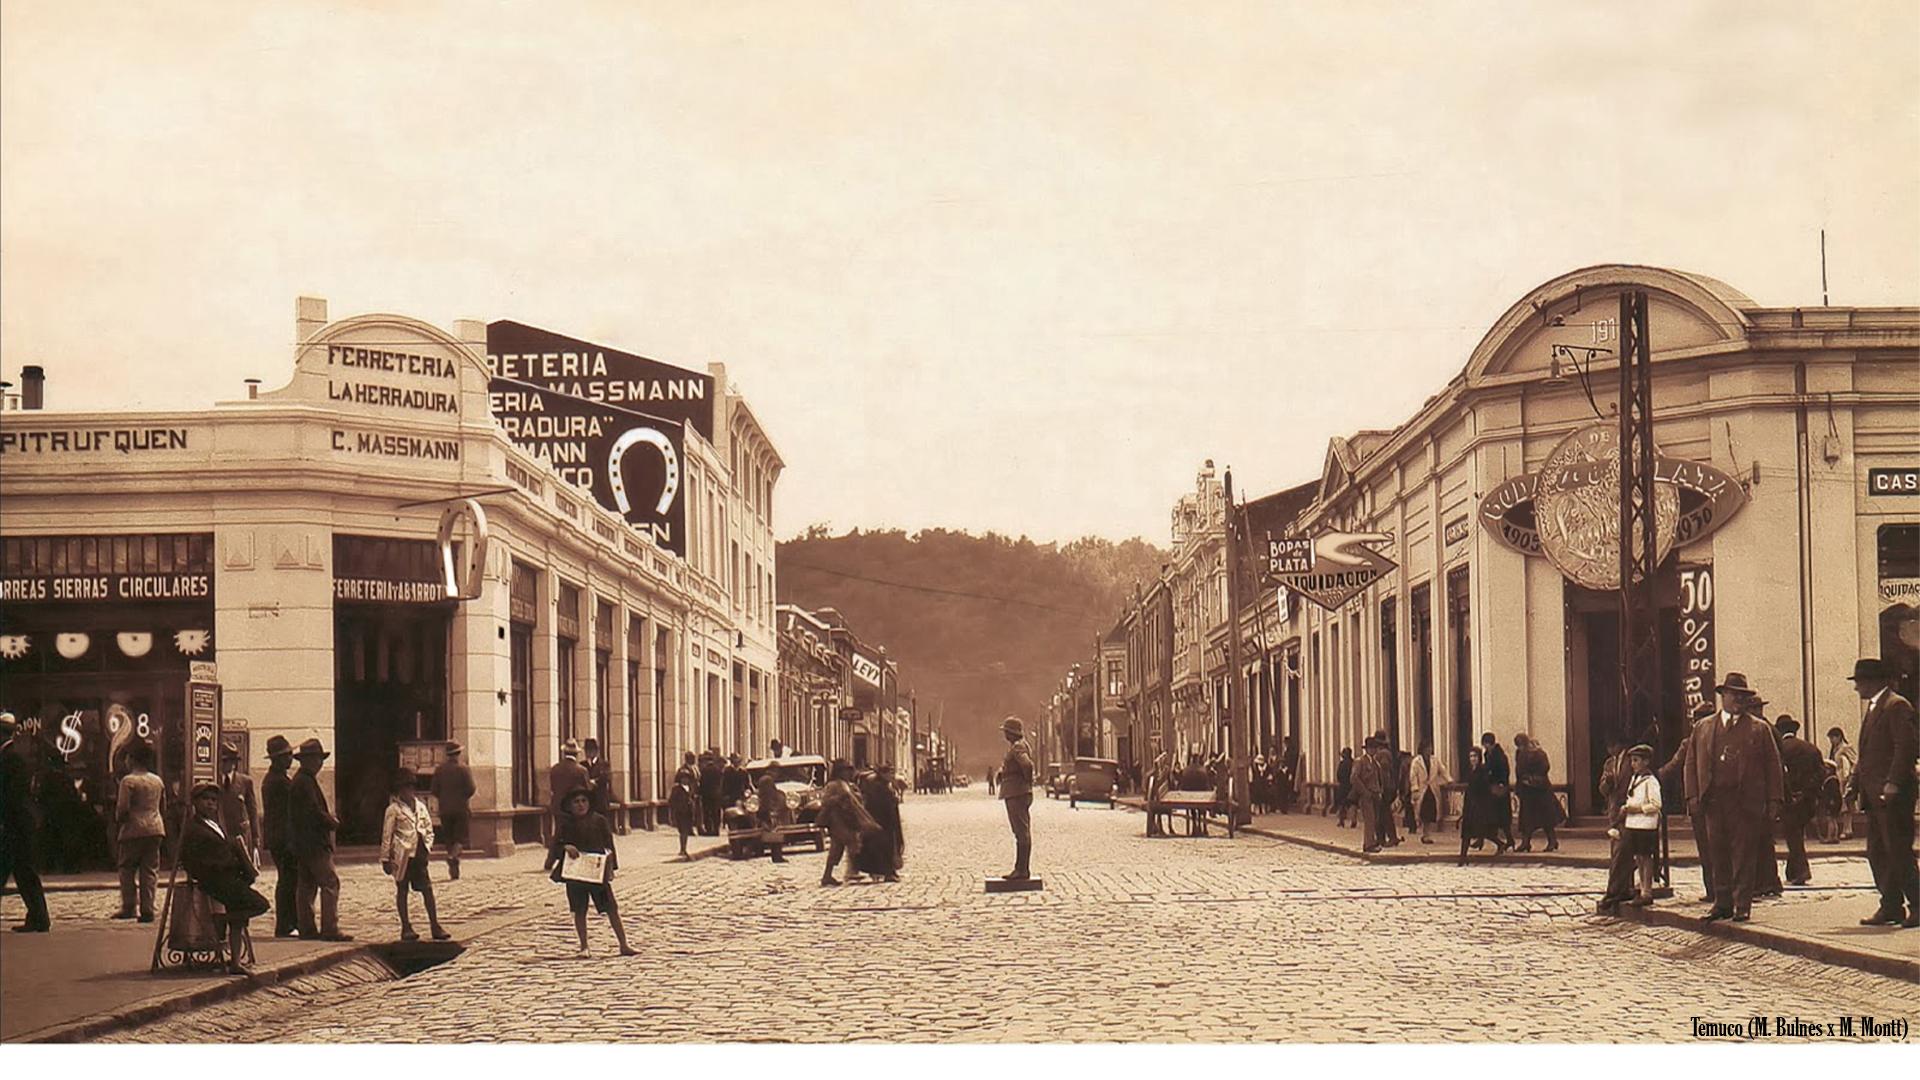 Enterreno - Fotos históricas de chile - fotos antiguas de Chile - Temuco, 1910